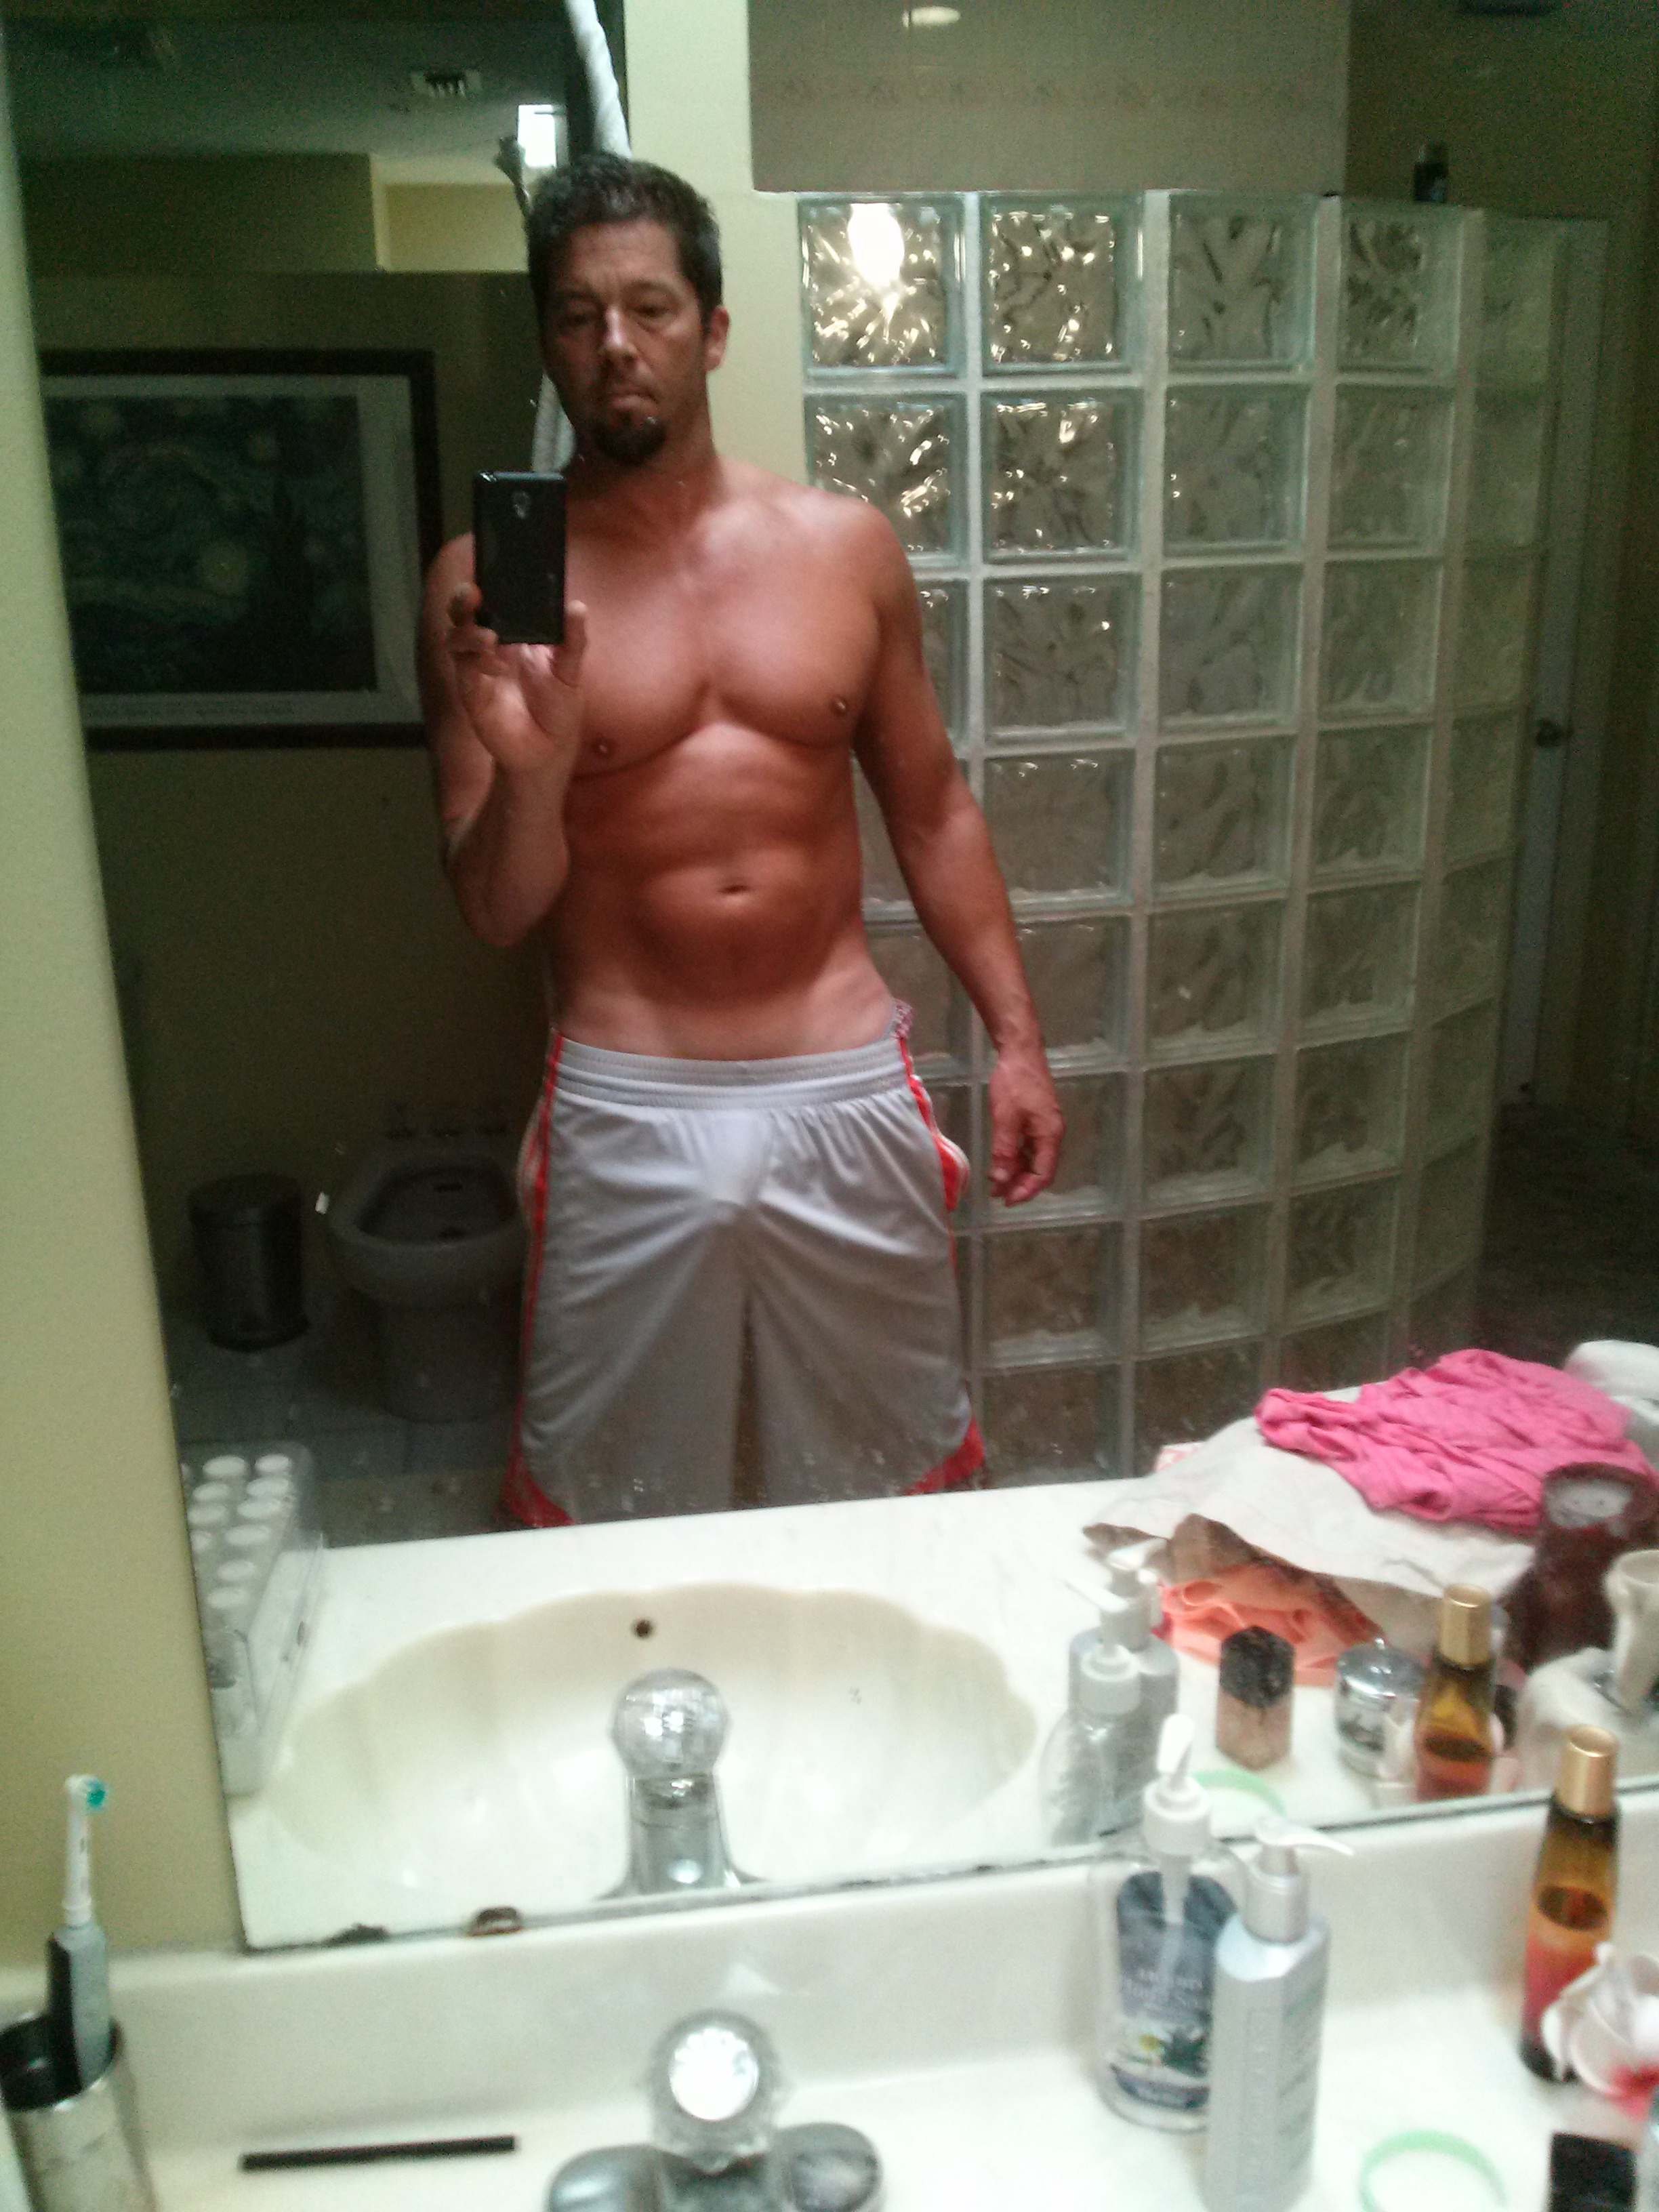 Hot guys on Fanpop images hot guys selfies HD wallpaper